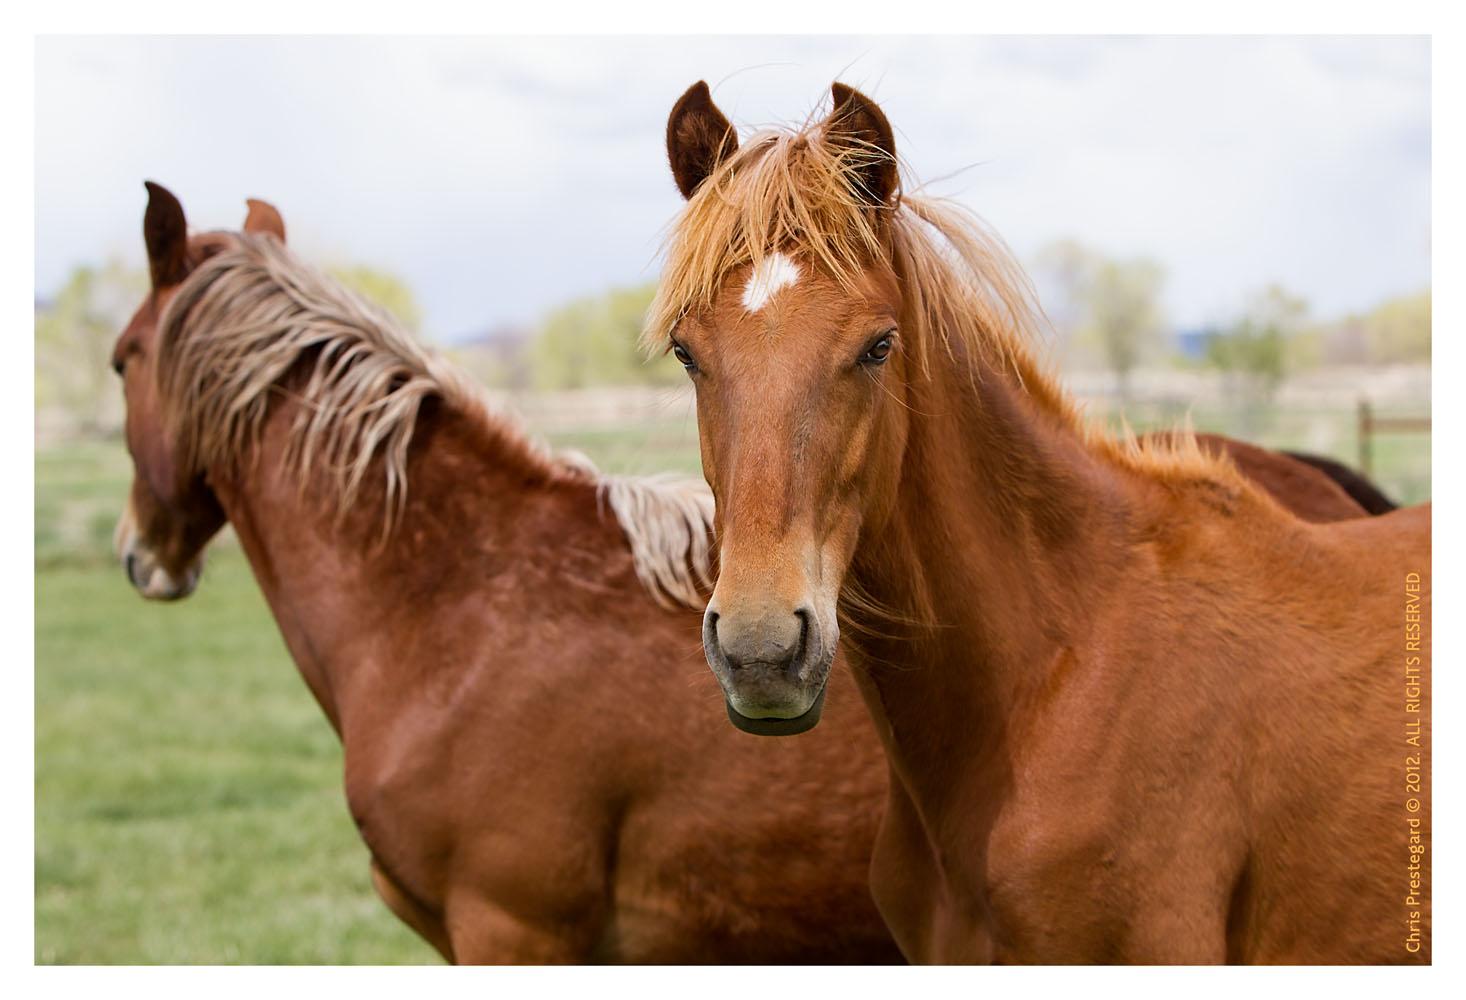 Horse3186-Feb14-2012